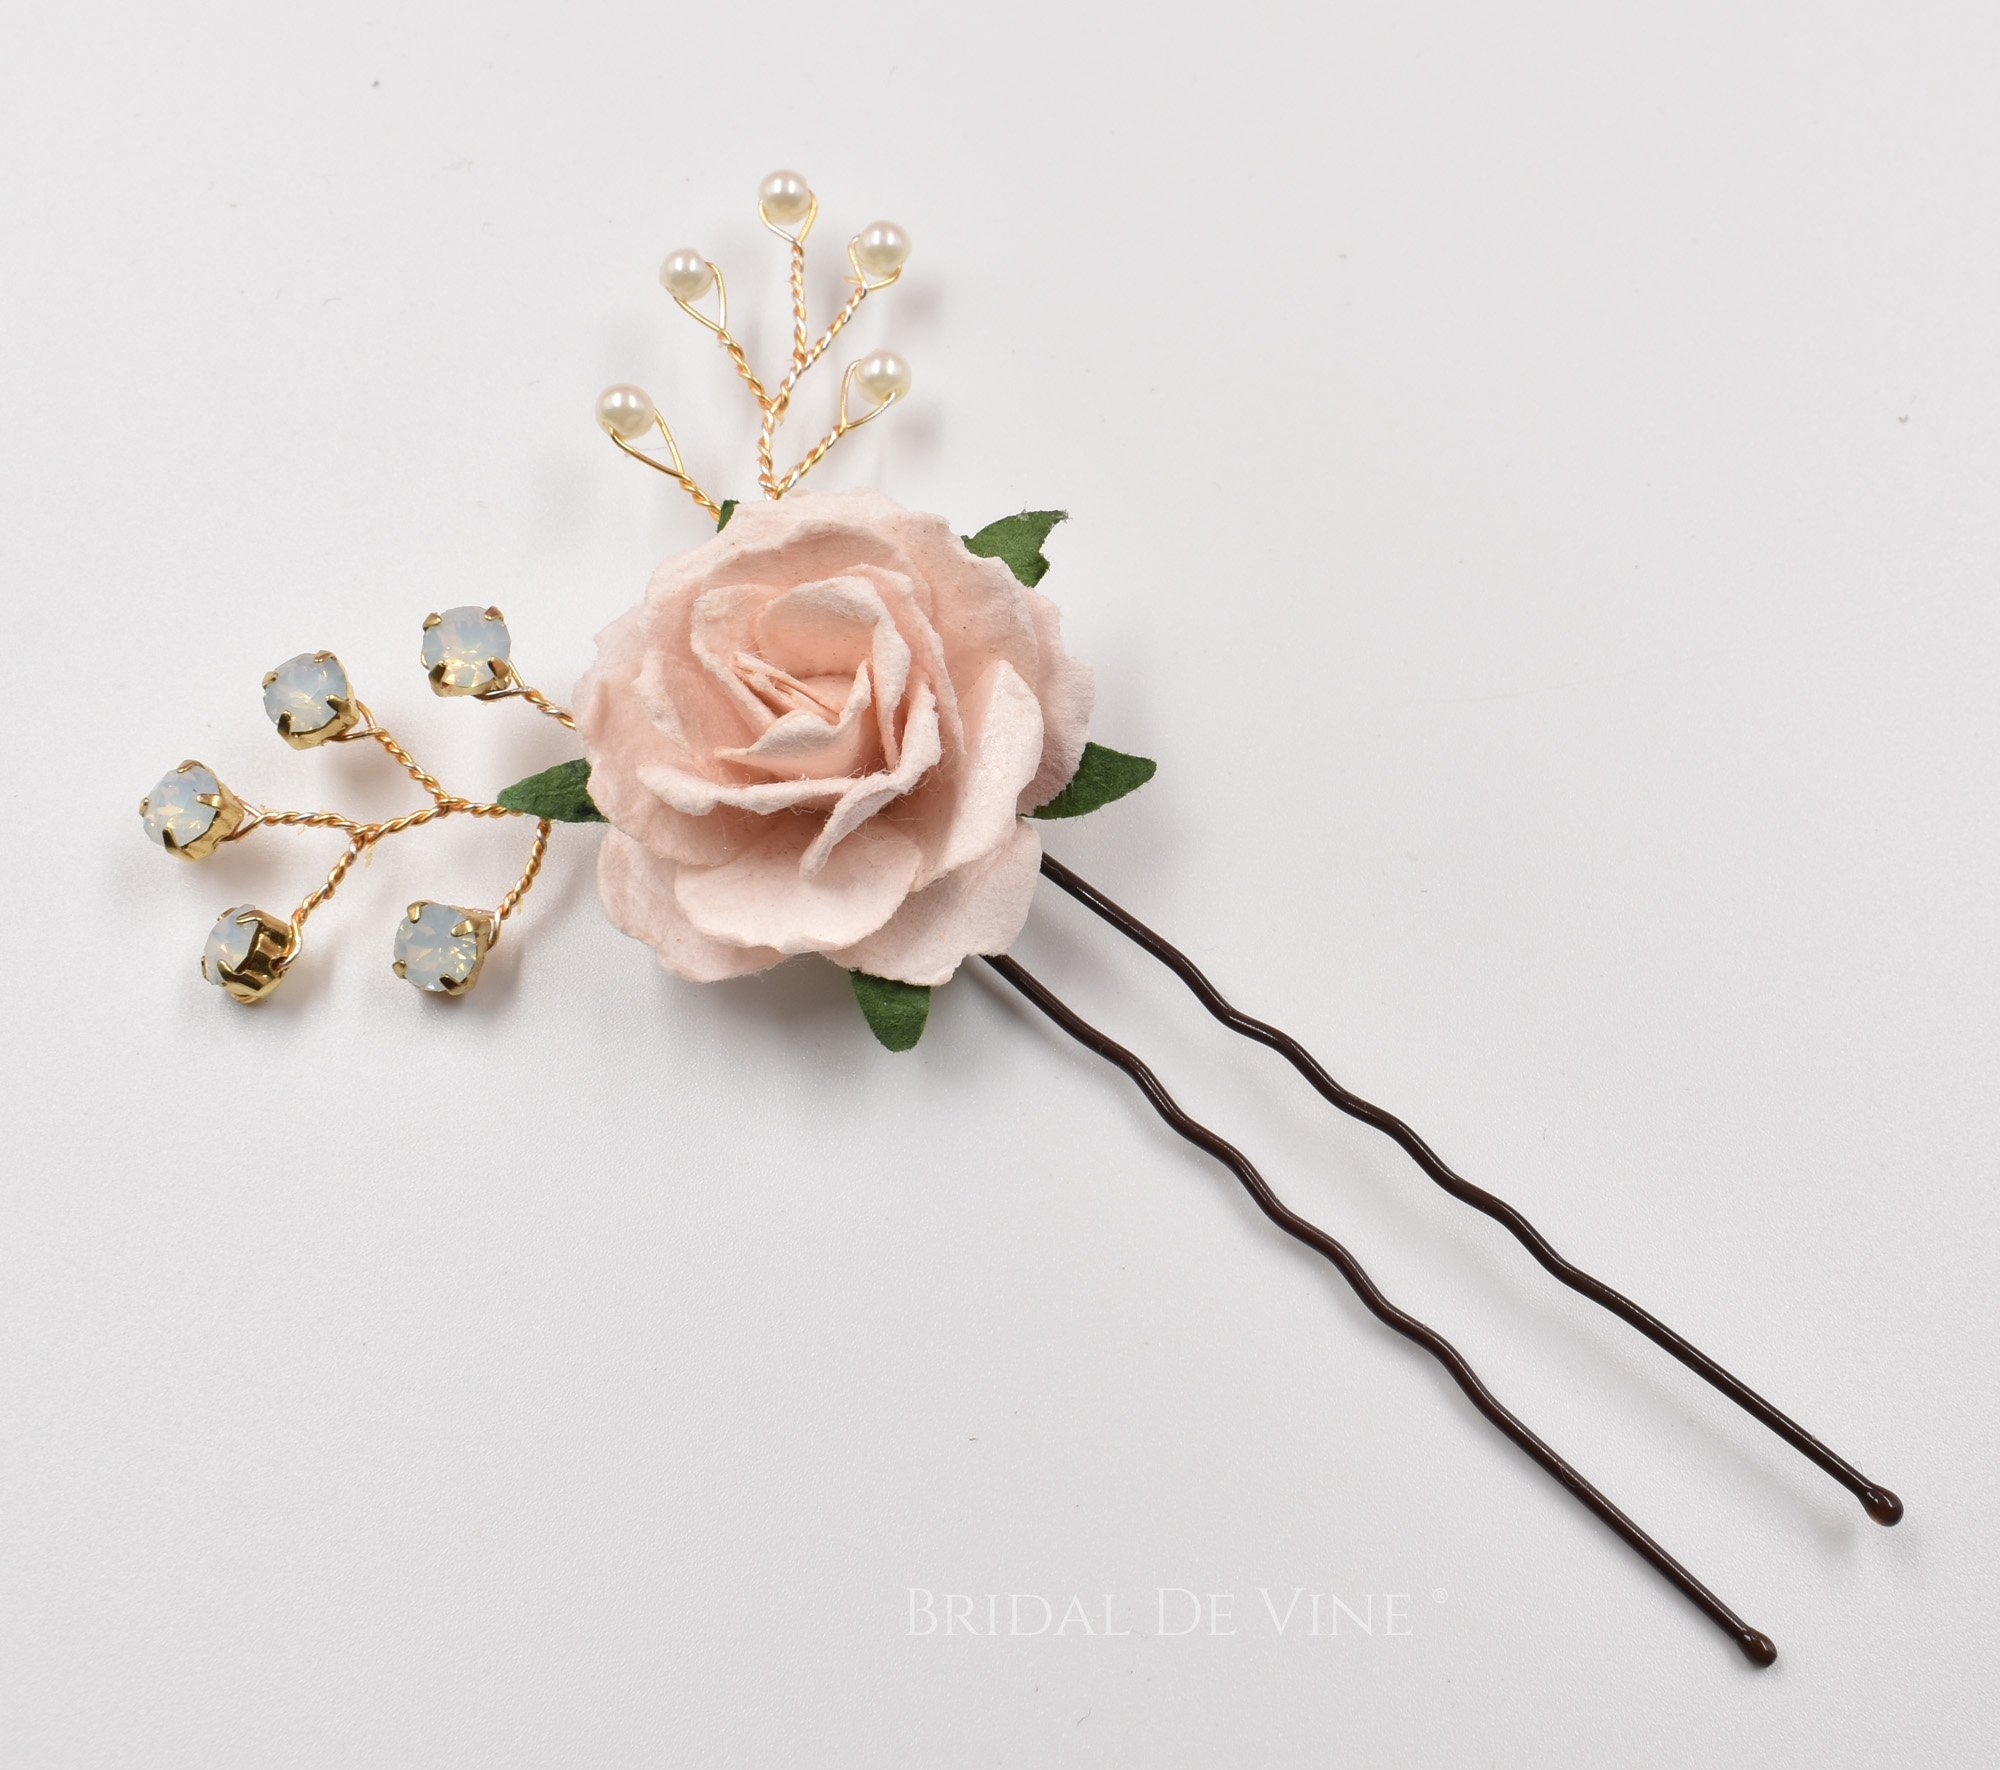 Ivory Blush Bridal Flower Hair Pin Hair Accessories Vintage Bride Bridal De Vine